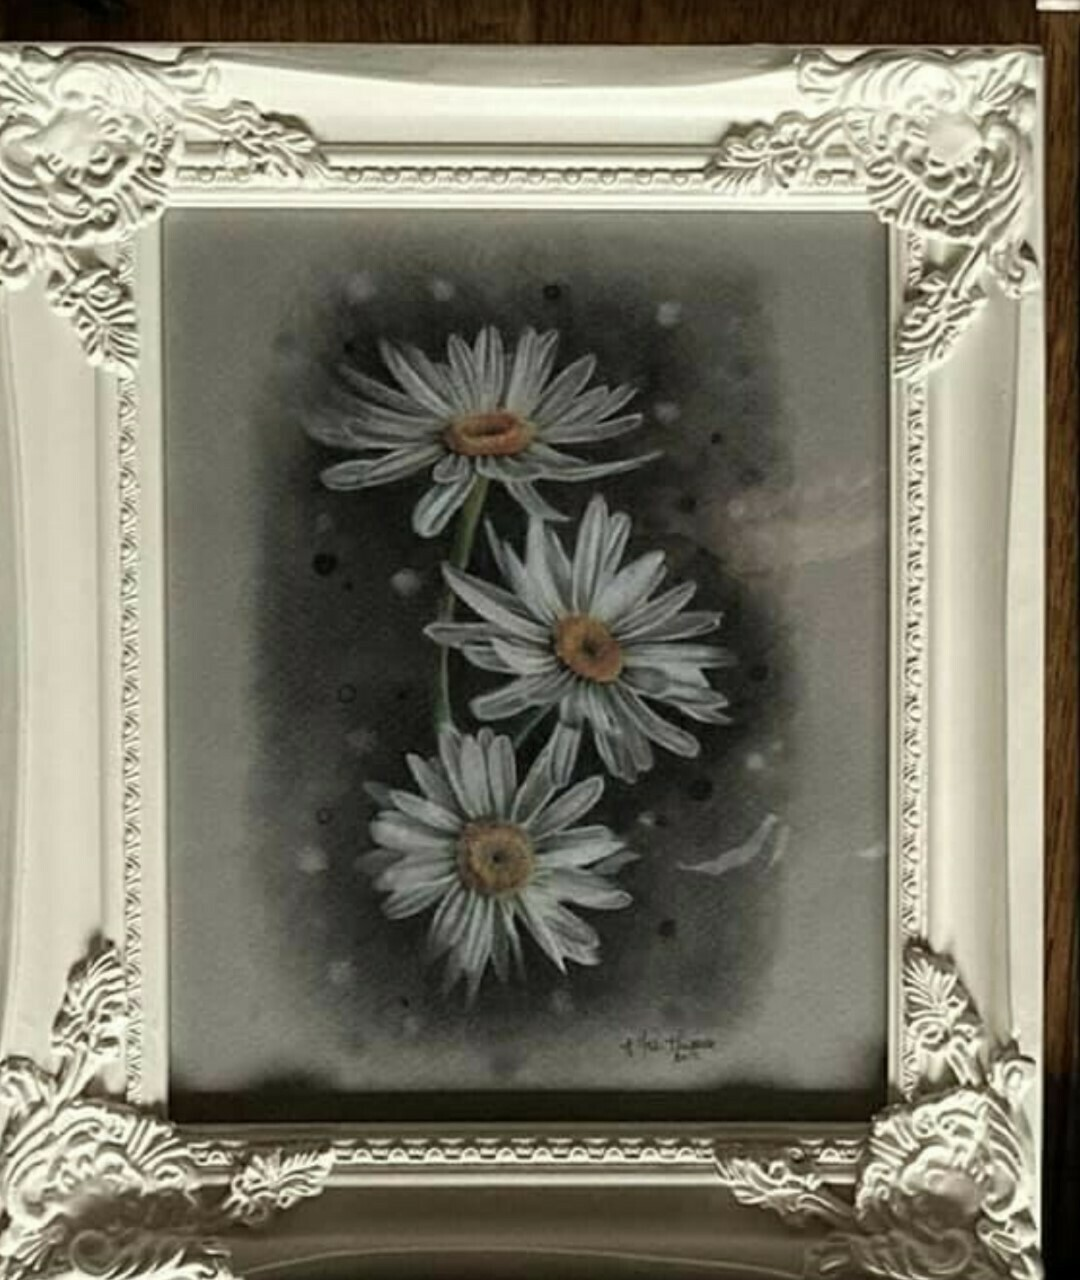 Gorgeous Original Painting of White Daisies